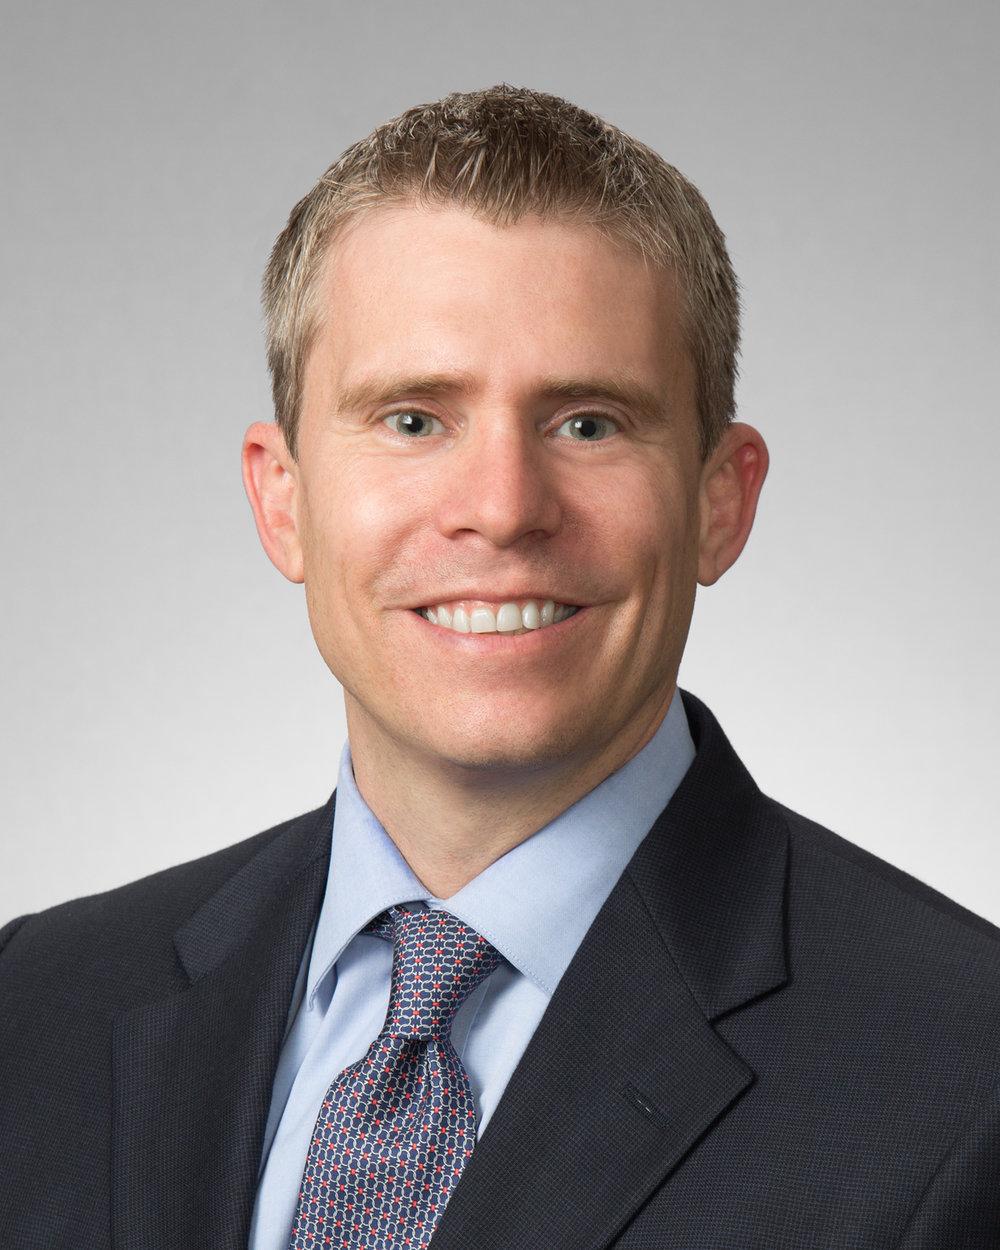 Bryan Magstadt